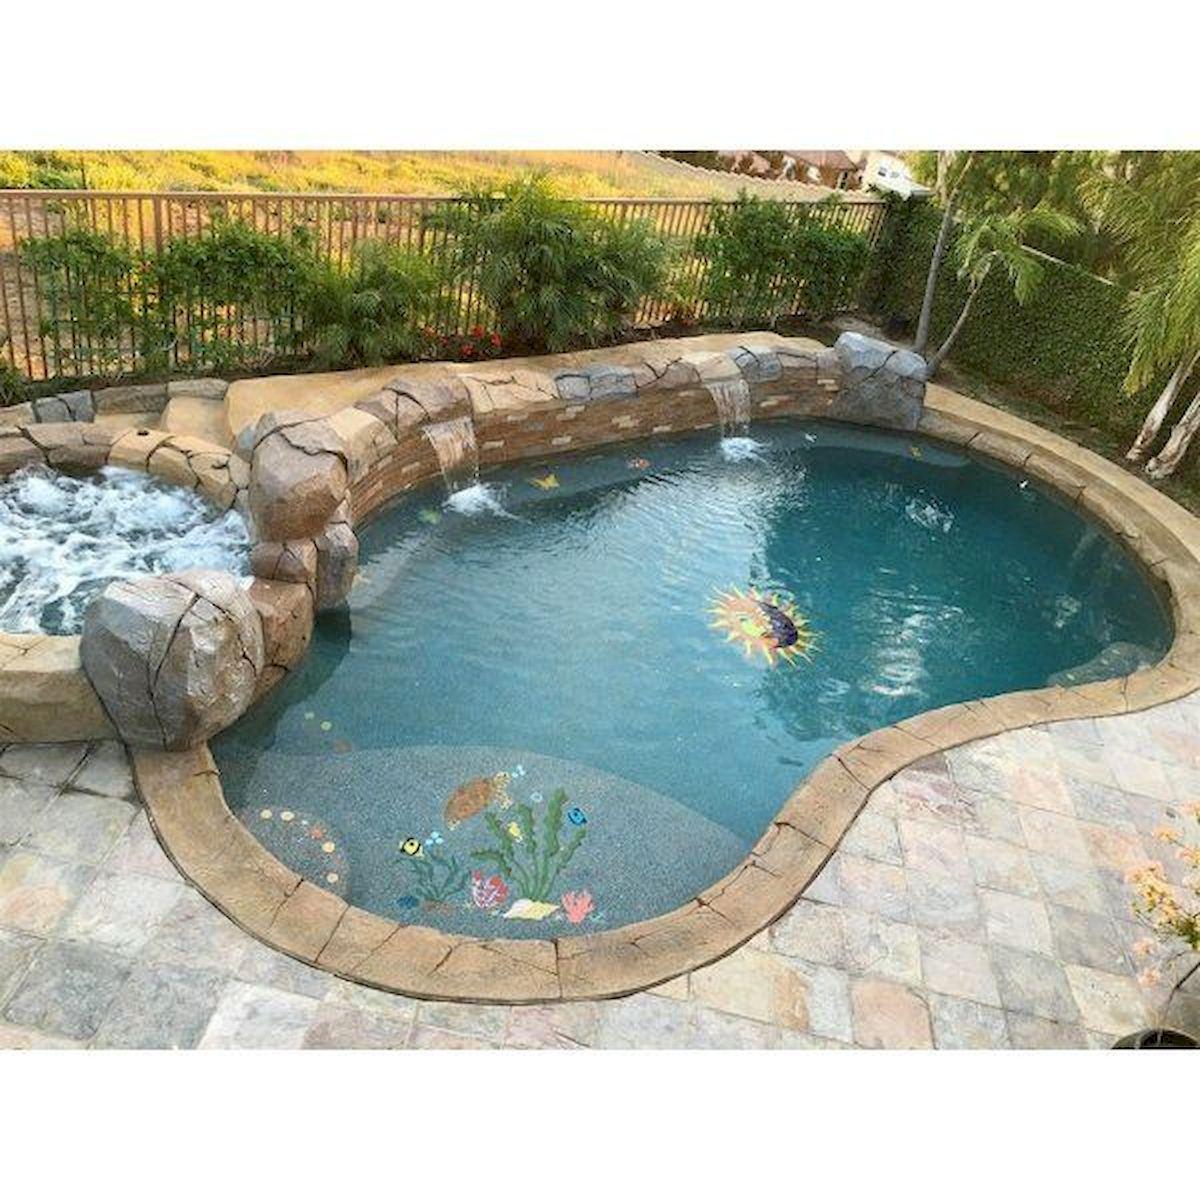 30 Awesome Backyard Swimming Pools Design Ideas (9)